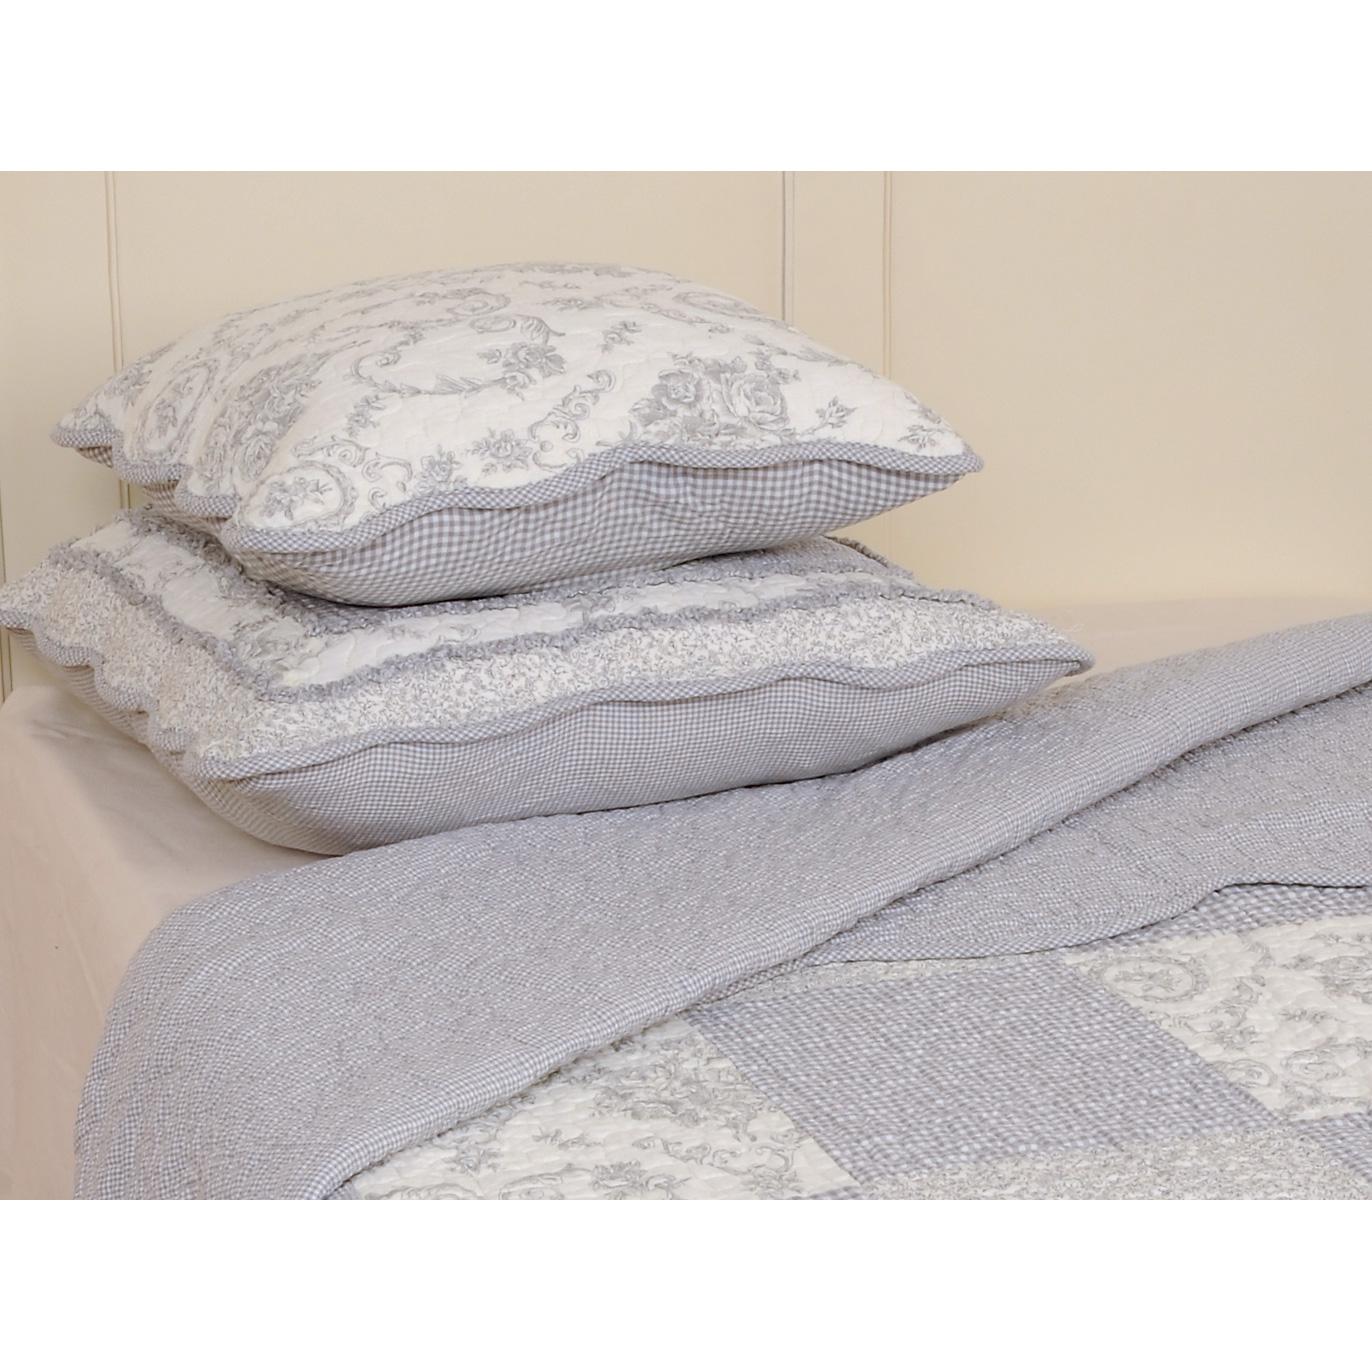 clayre eef tagesdecke plaid grau patchwork 180x260cm 016658. Black Bedroom Furniture Sets. Home Design Ideas